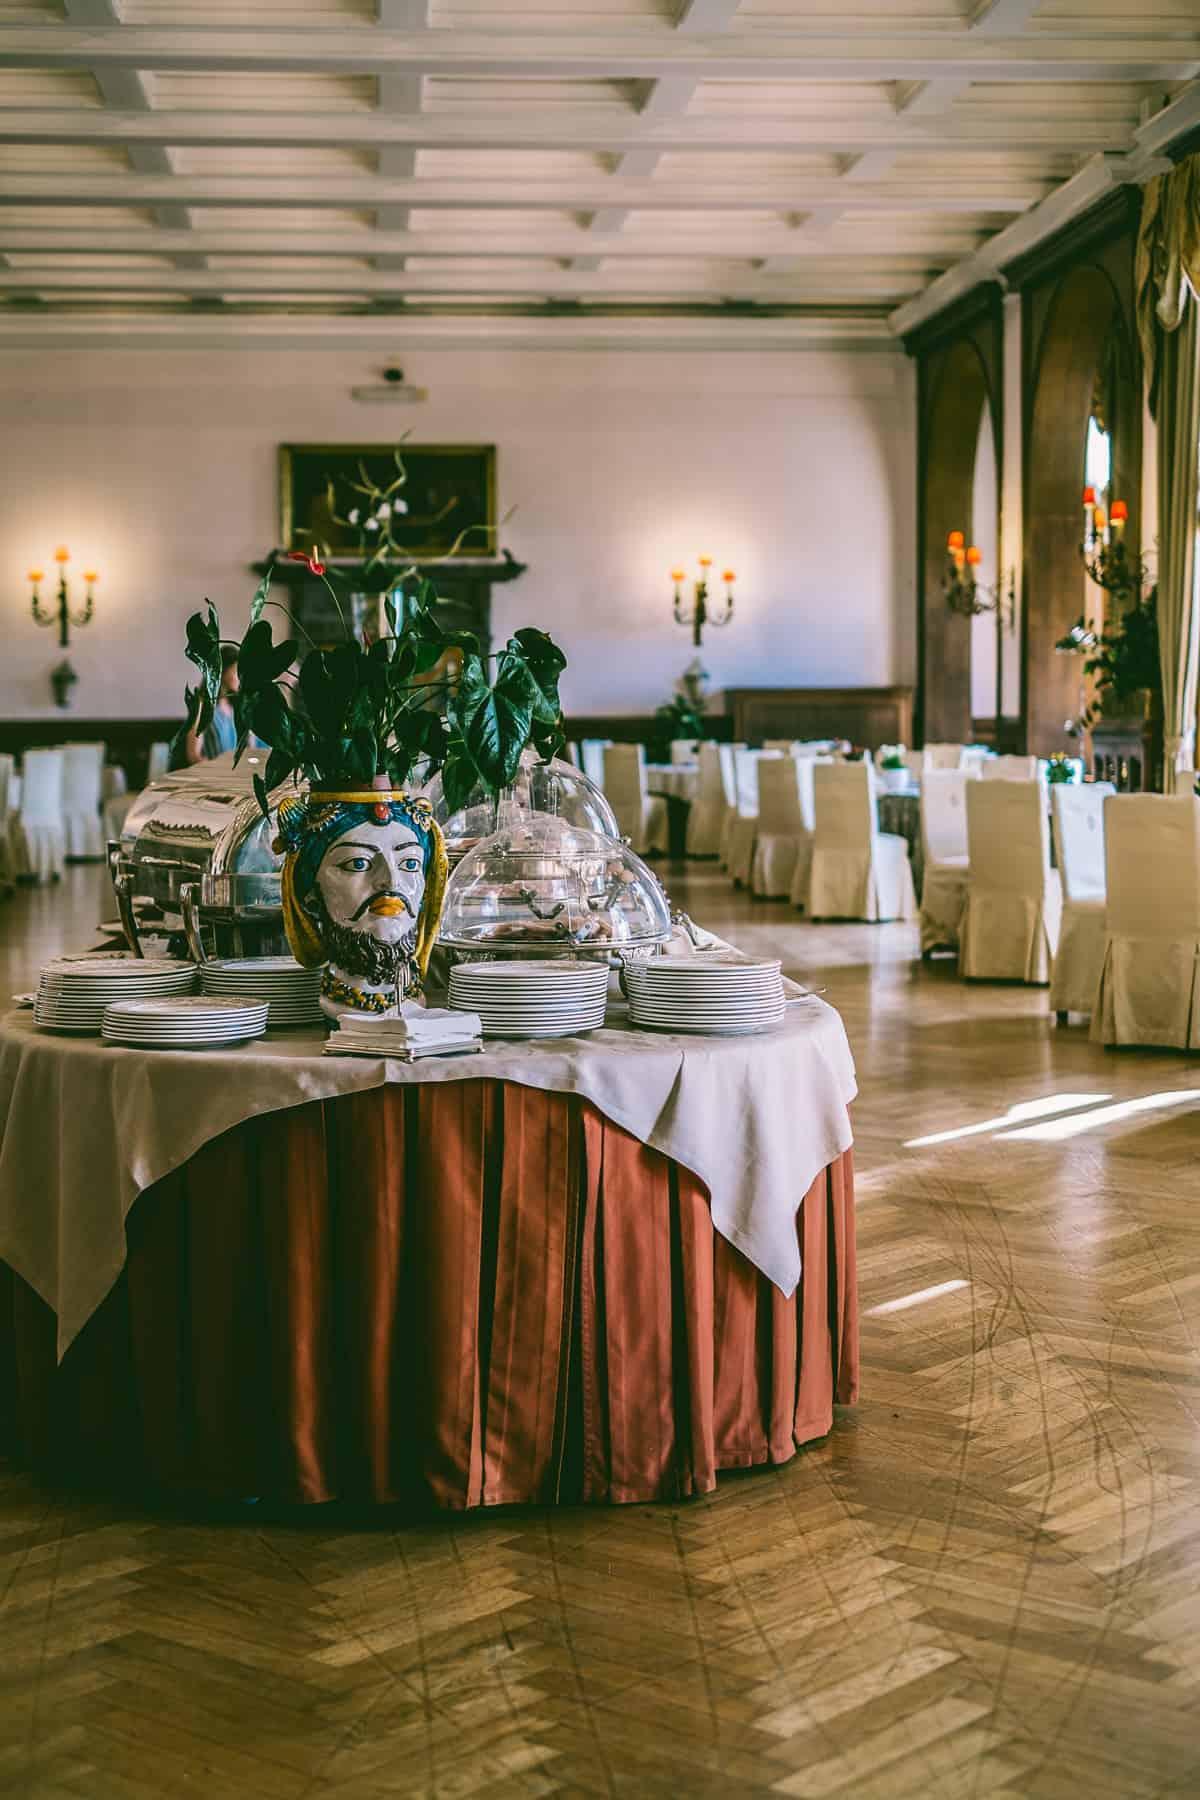 breakfast buffet at old world hotel in Taormina Sicily